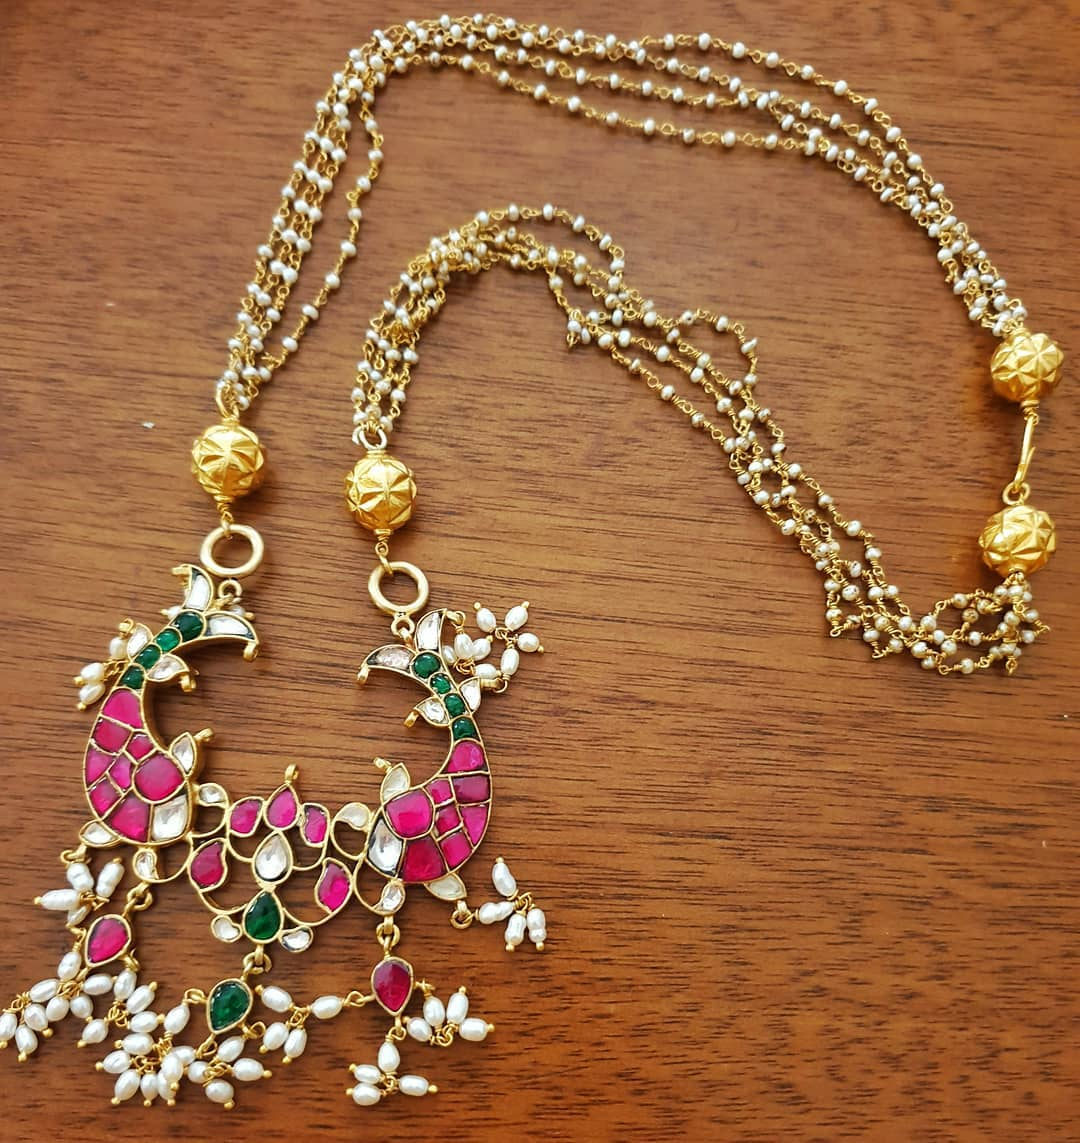 92-5-silver-jewellery-designs-2019 (3)